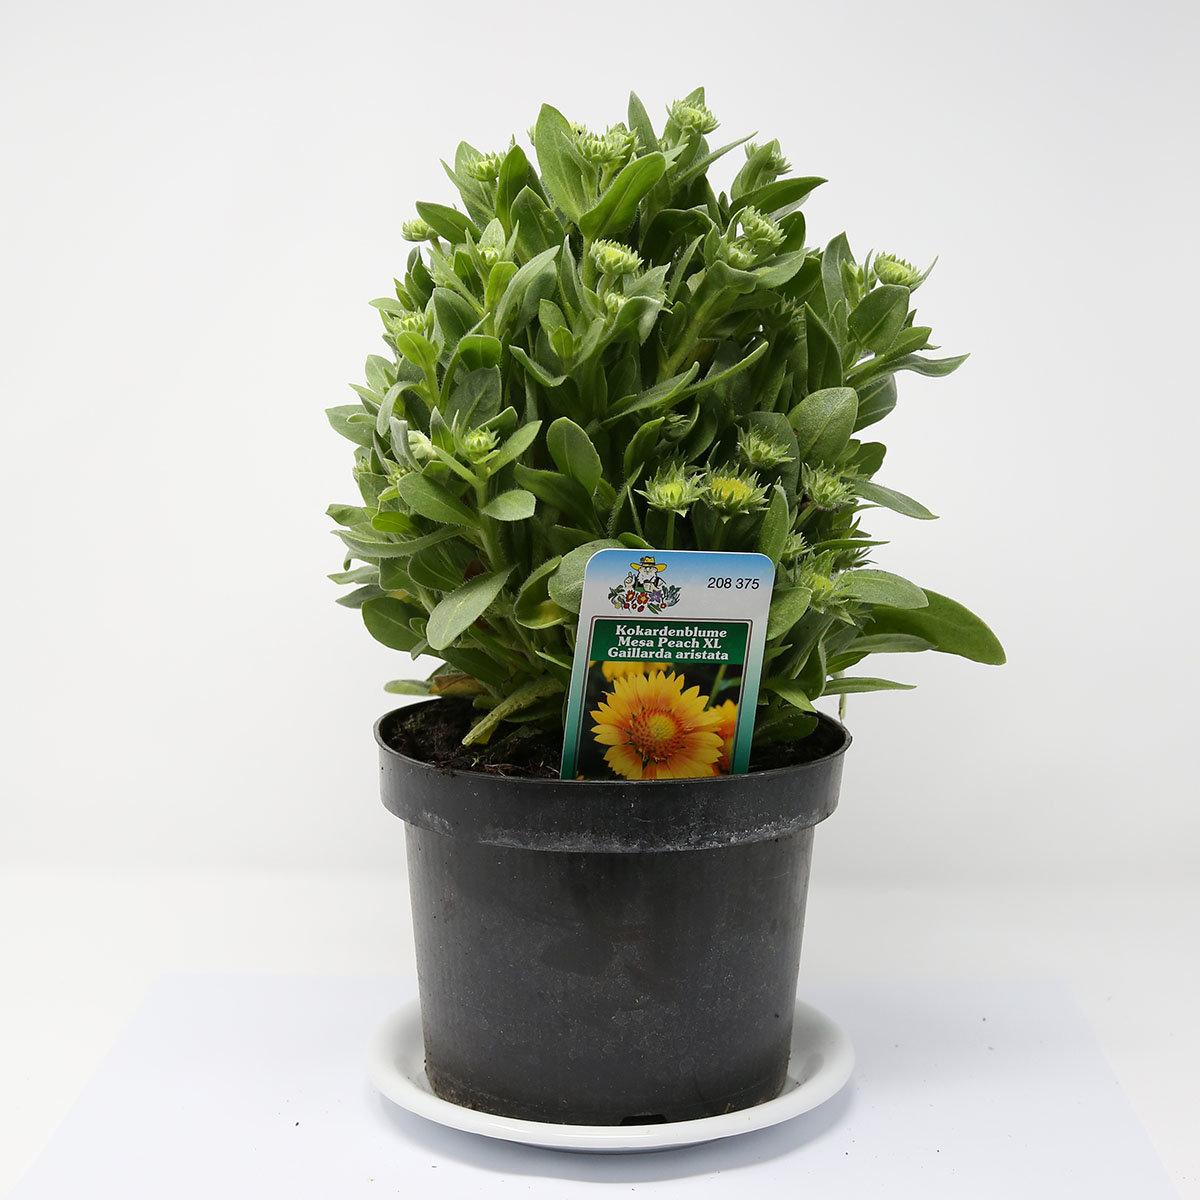 Kokardenblume Mesa Peach, XL-Qualität | #3